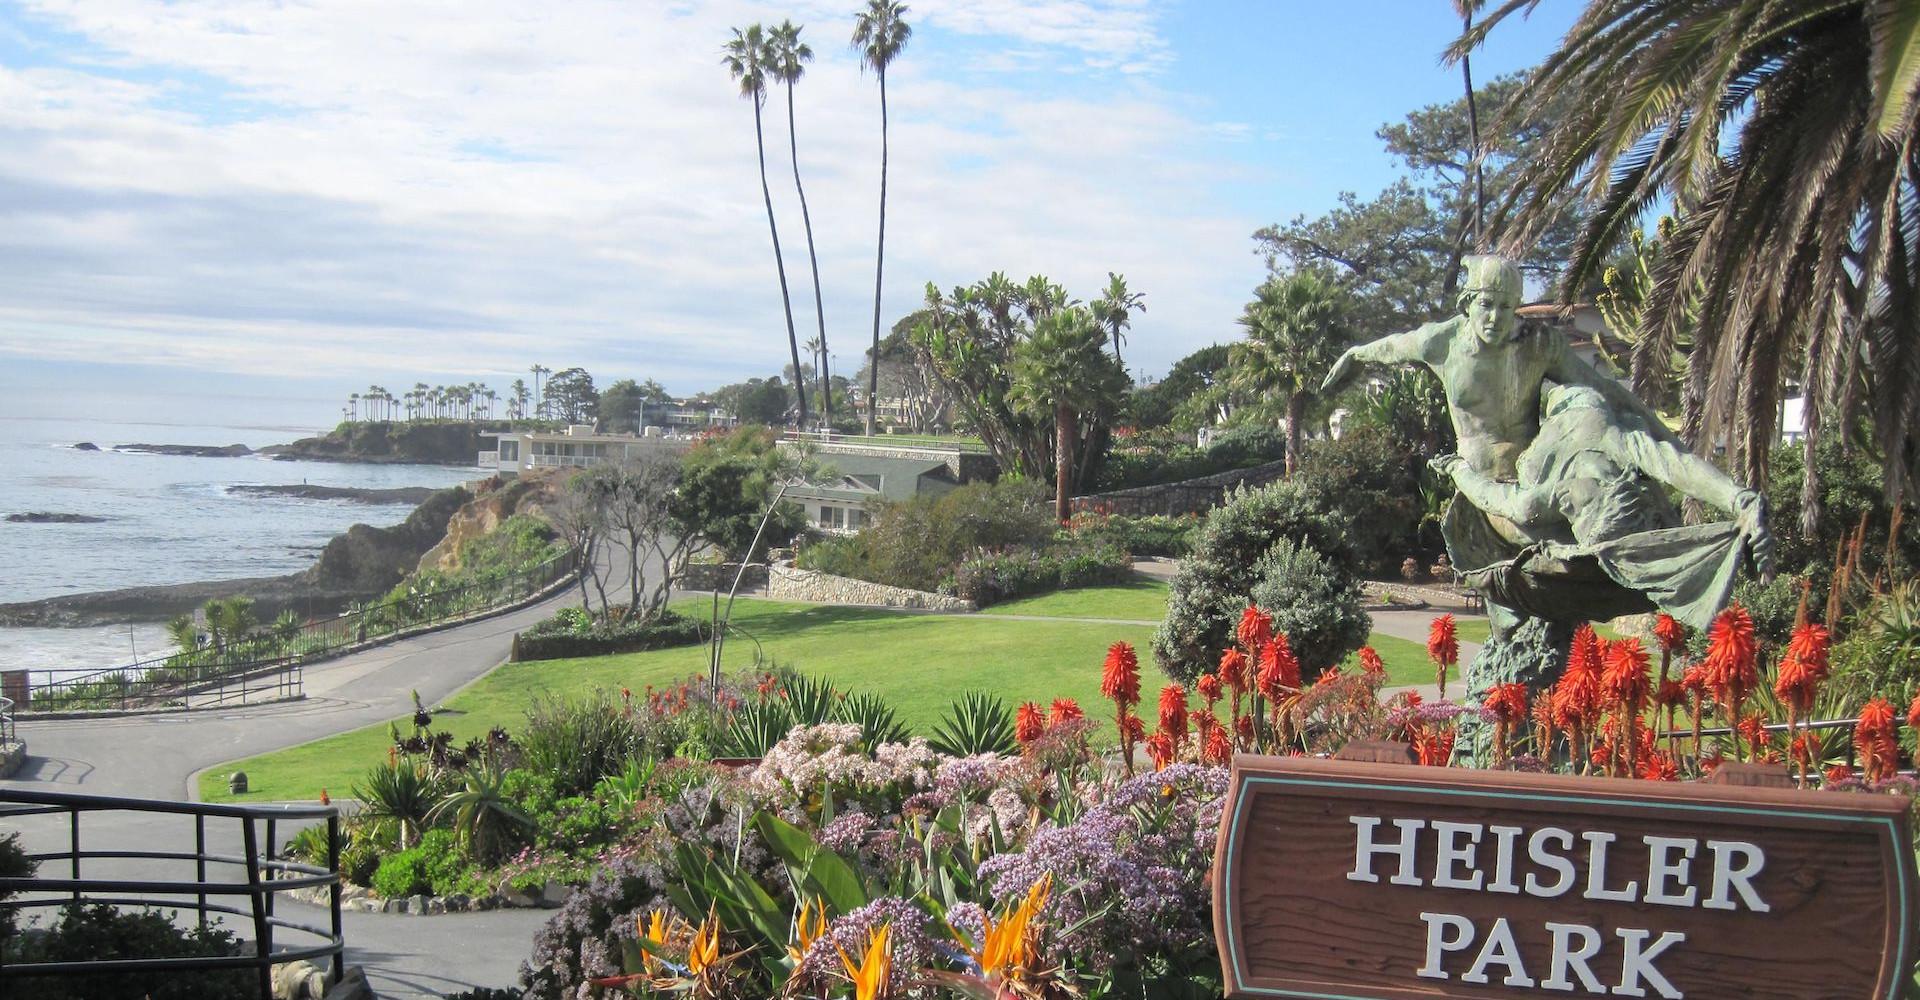 Heisler Park - 1.2 miles